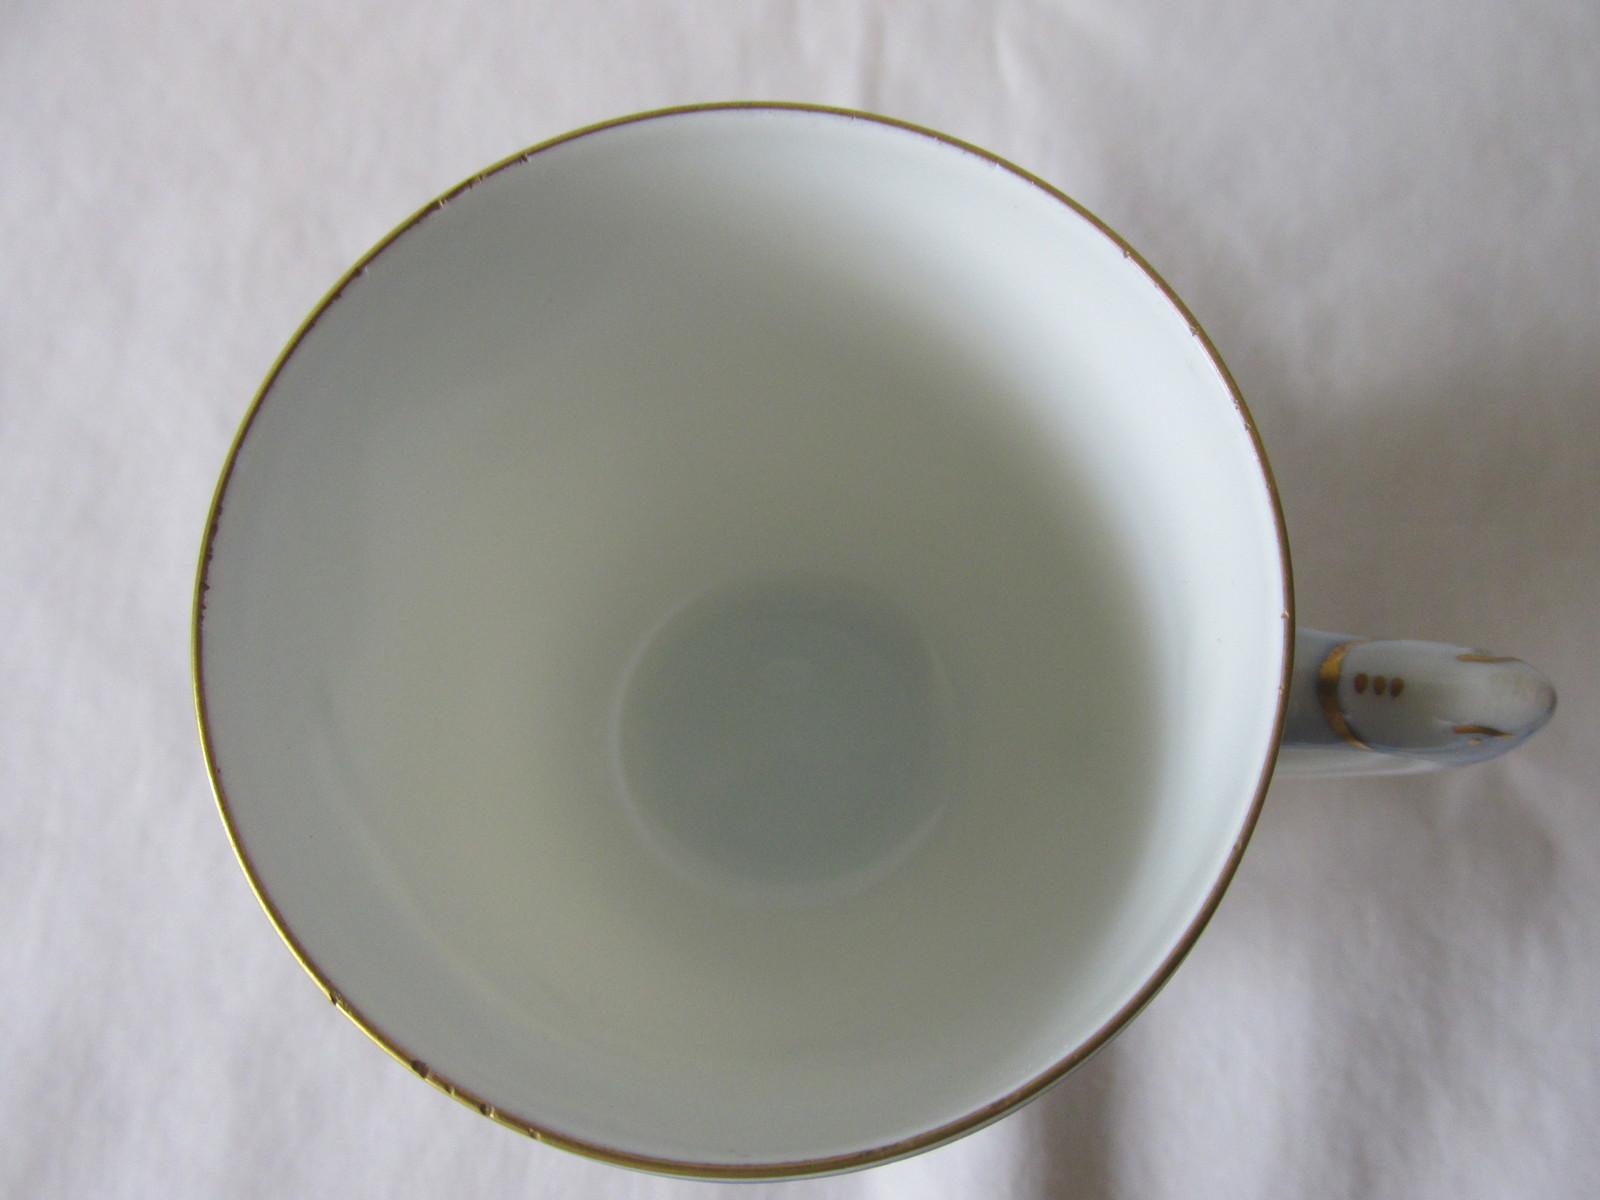 Vintage Bing & Grondahl Danish Bone China Demitasse Seagull Cup & Saucer - 1960s